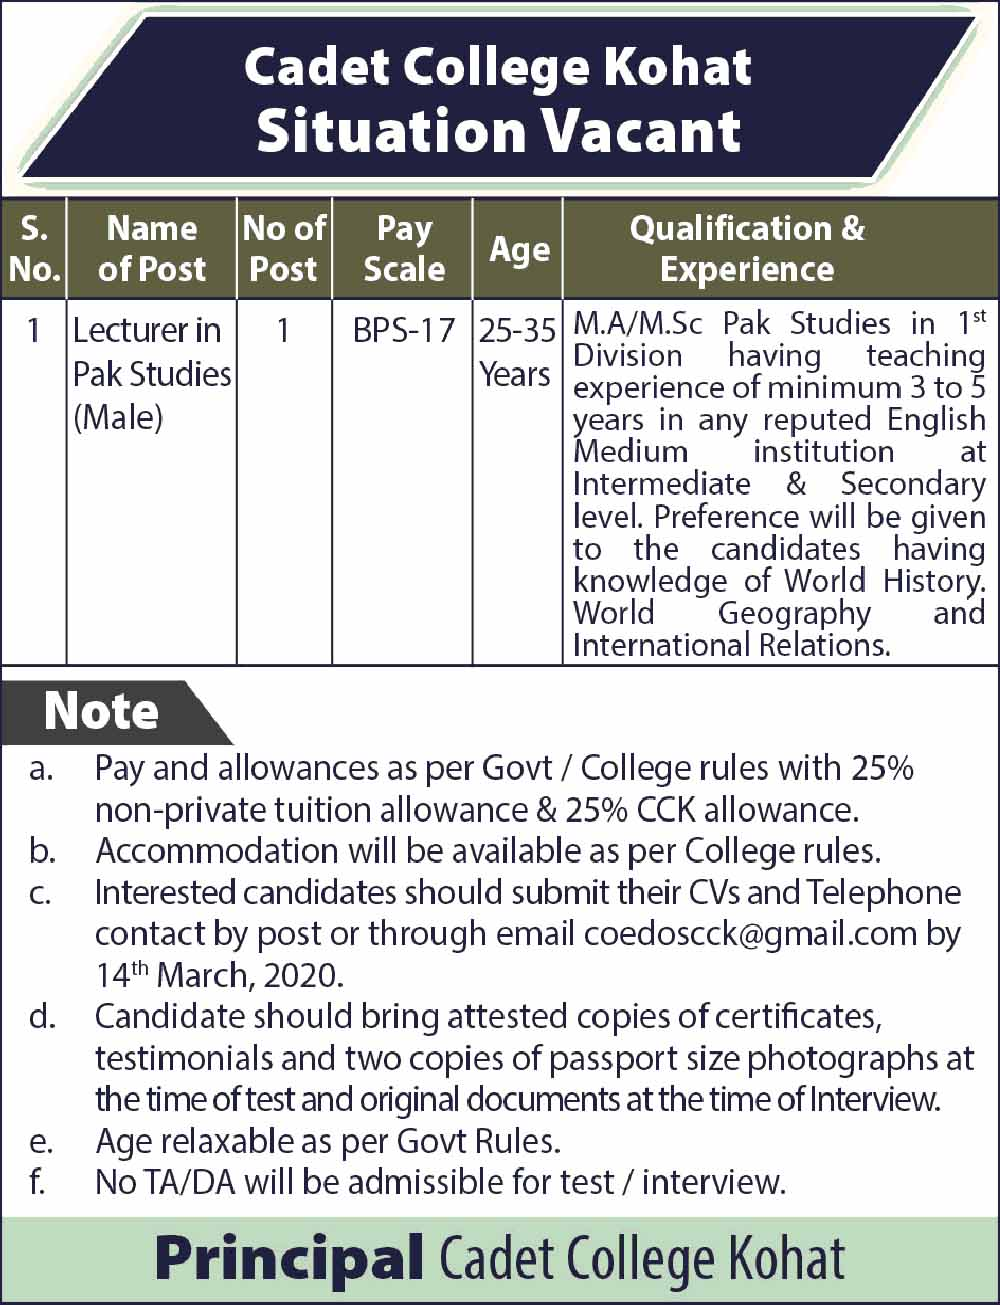 Lecturer - MA / MSc Pak Studies in 1st Division